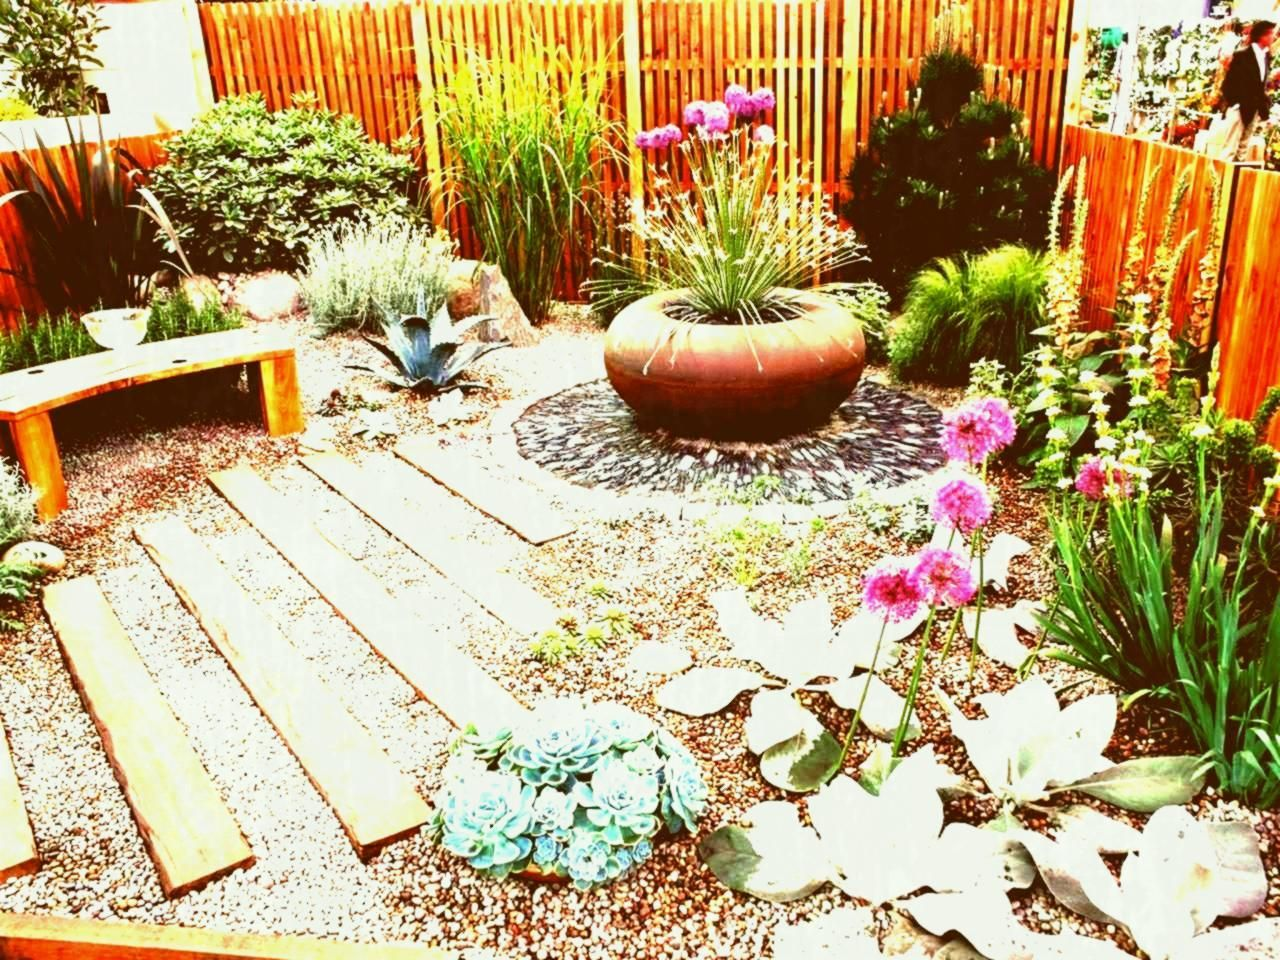 Rx Dk Ssfg Gravel Cover S Rend Hgtvcom Cheap Low Maintenance Garden Ideas Uk Small Colourful